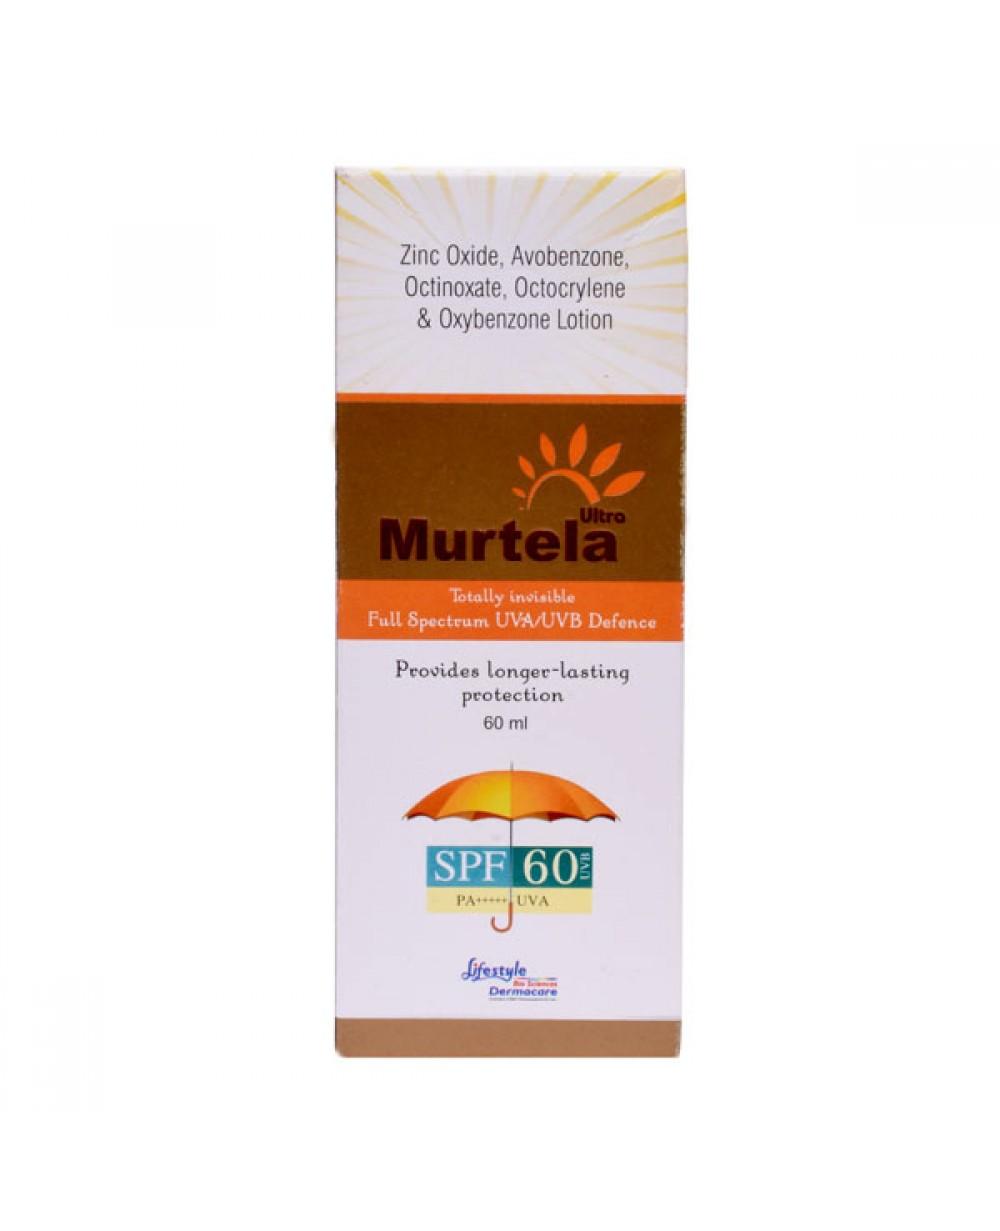 Murtela Ultra Sunscreen Lotion - 60ml